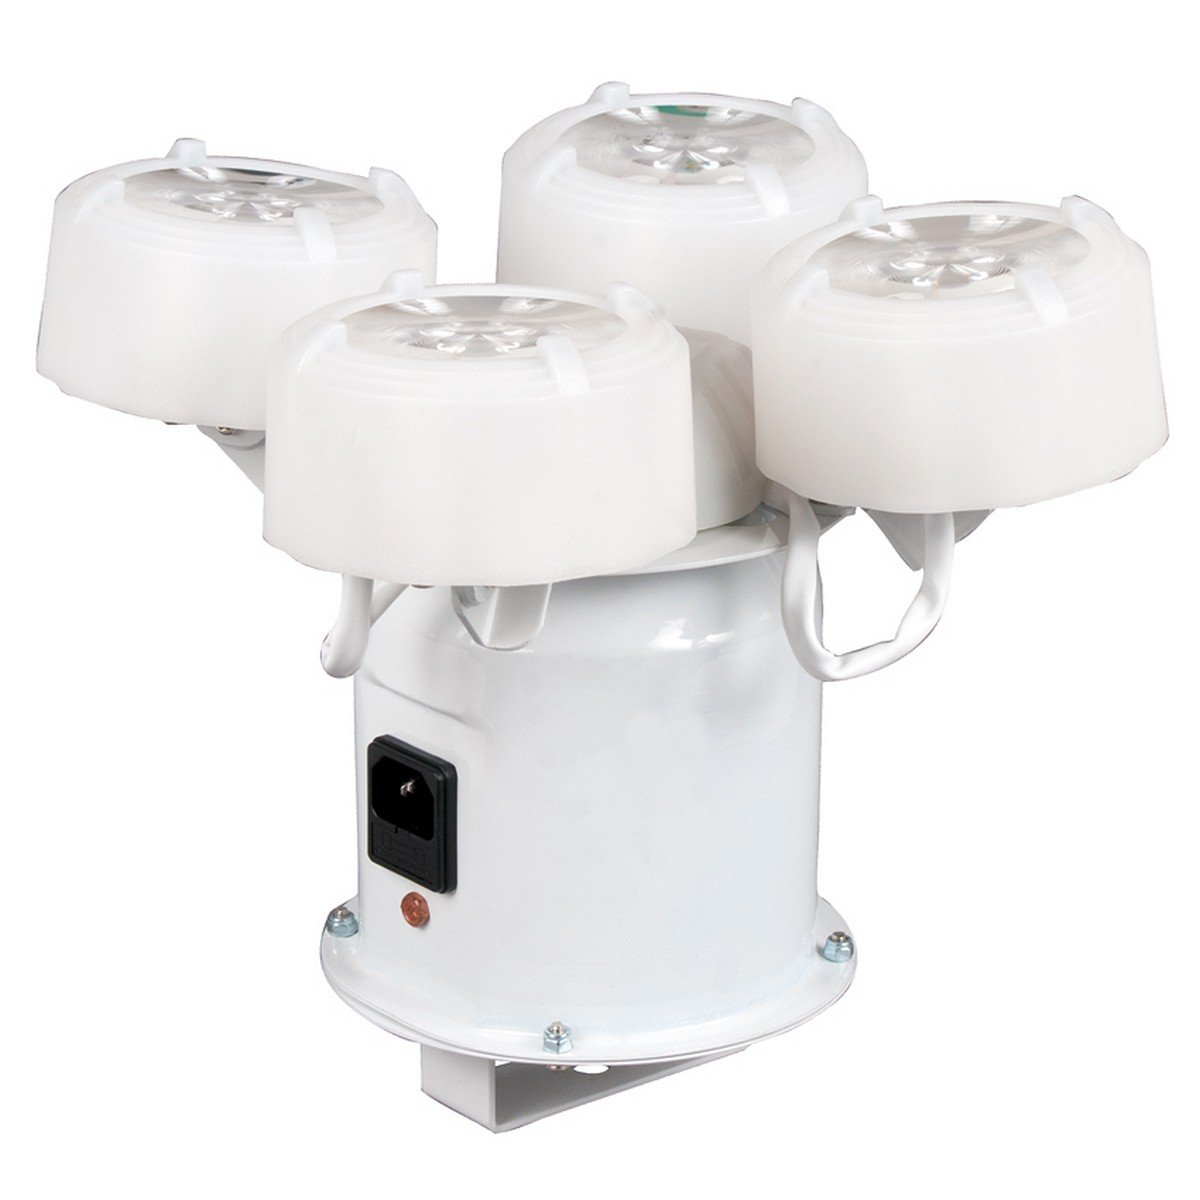 ADJ Products ROTOBEAM 4 360 Degree Cont Rotating LED